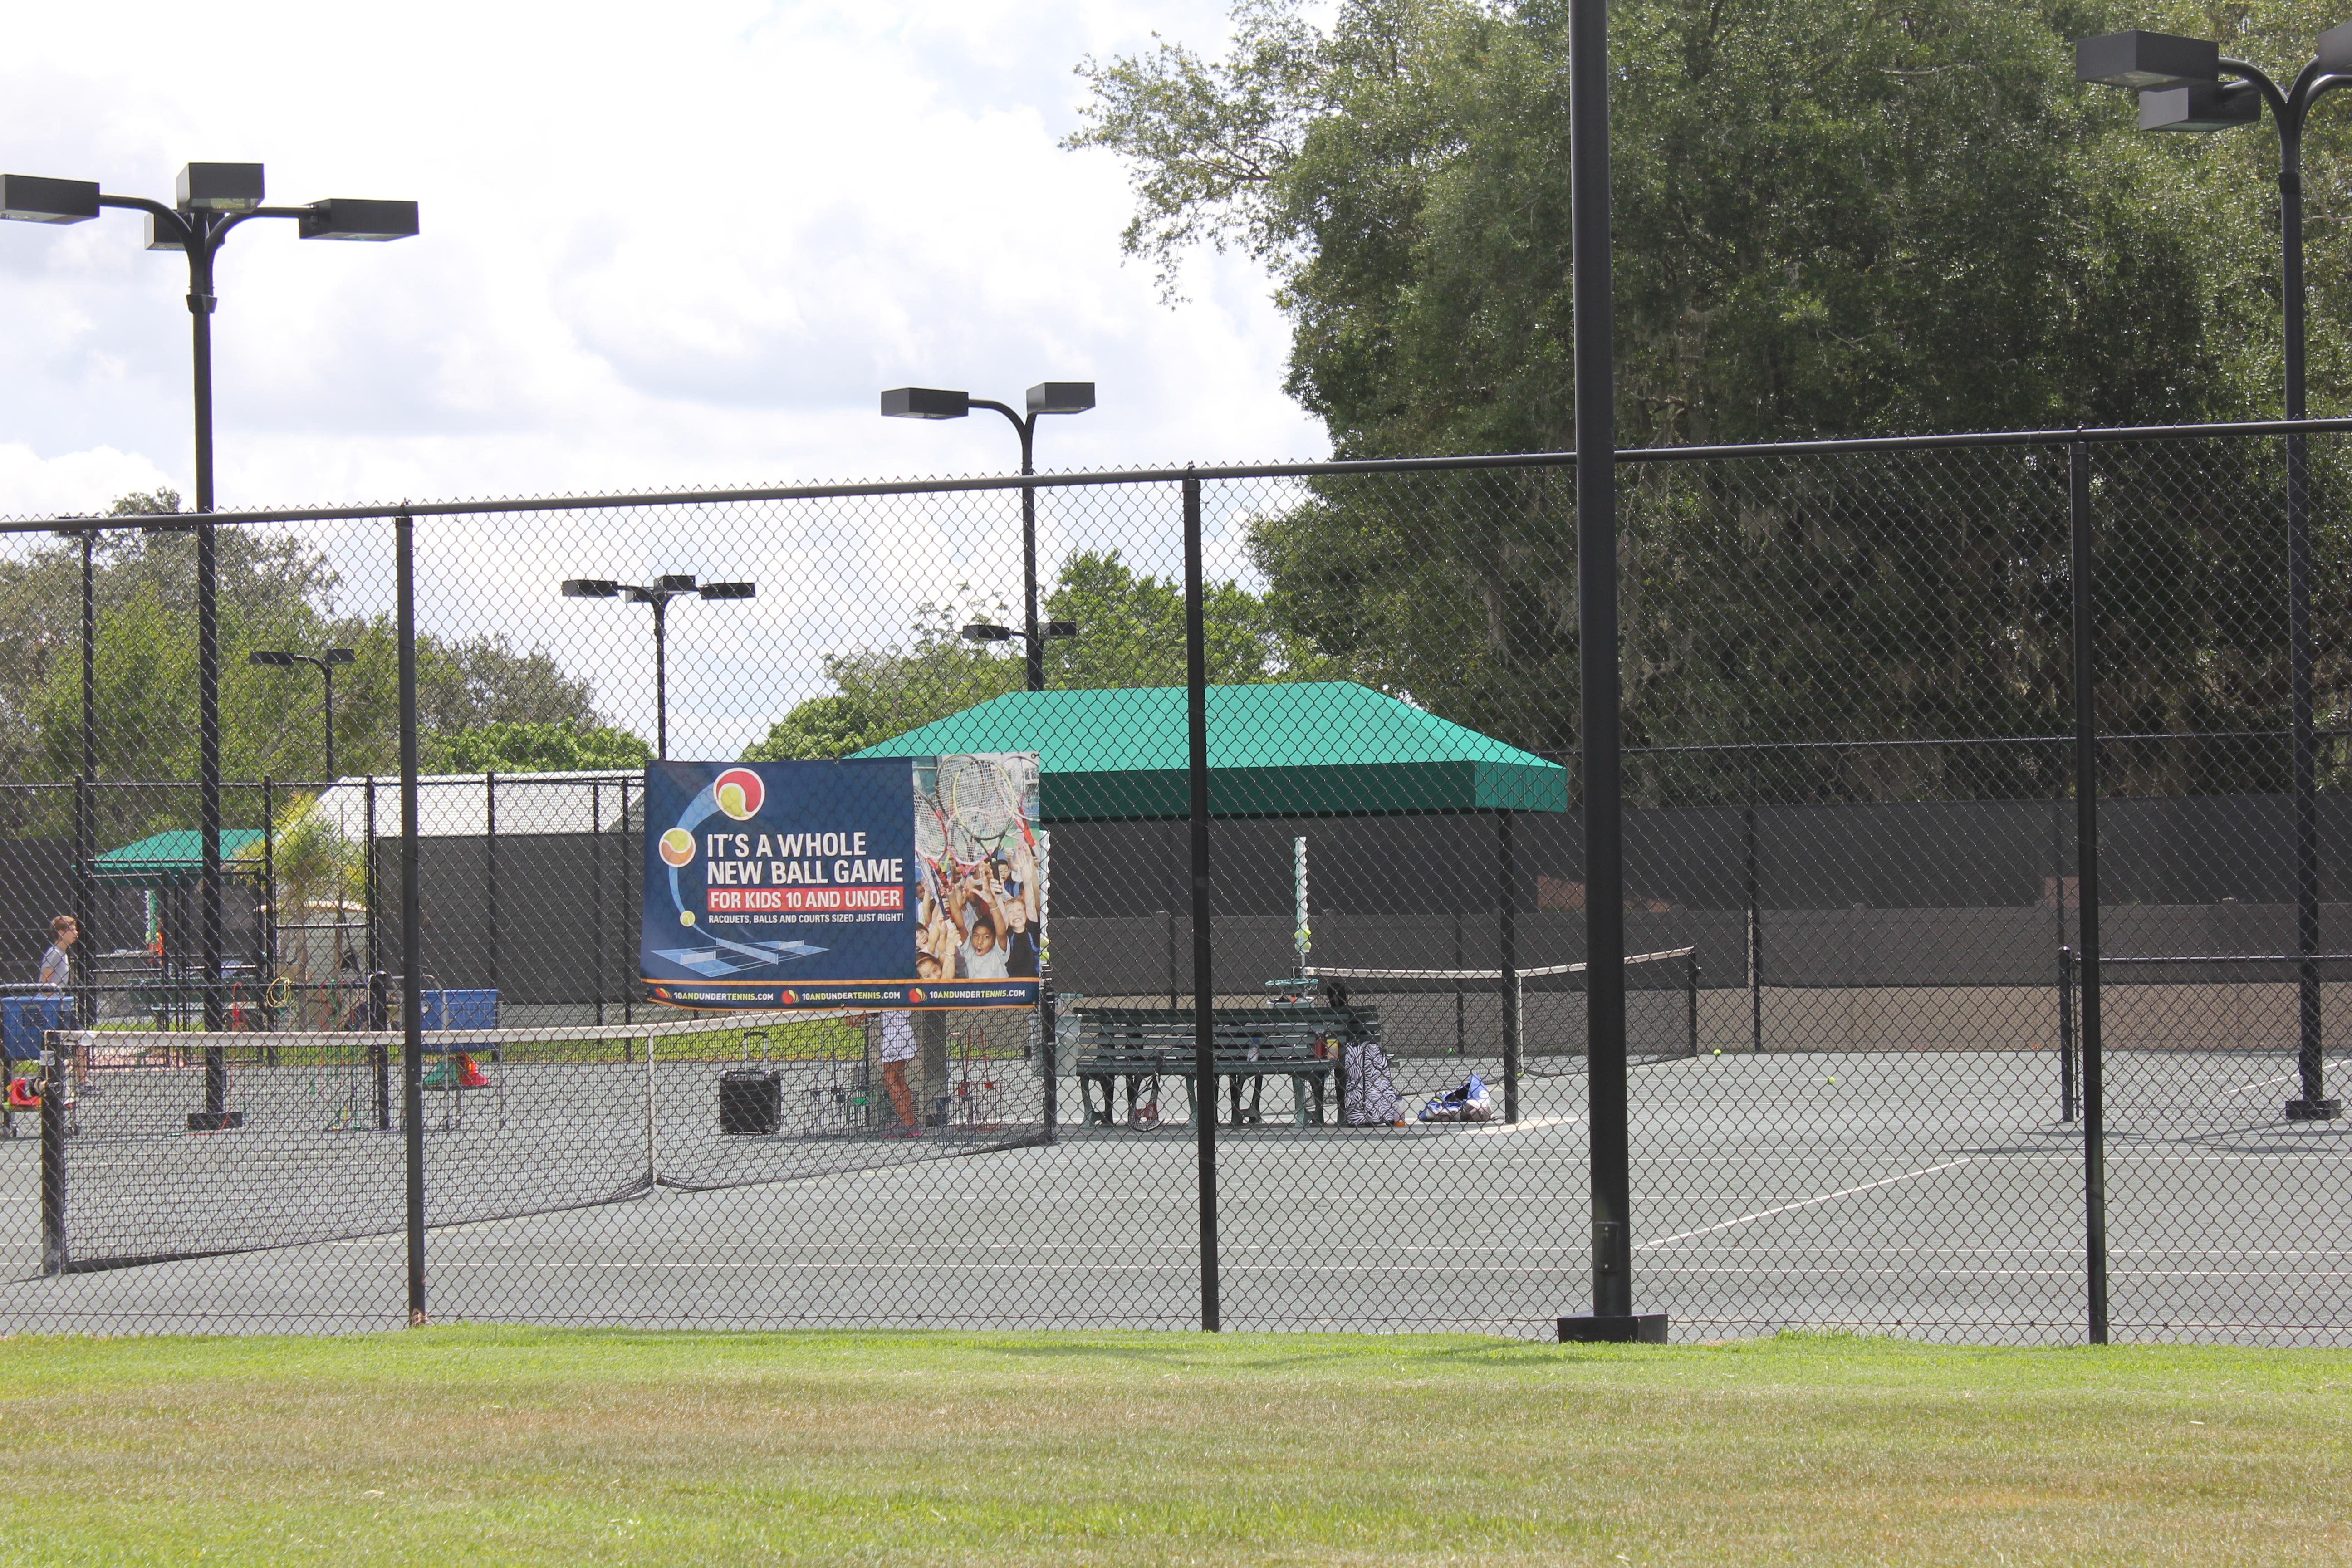 The Auburndale Tennis Center